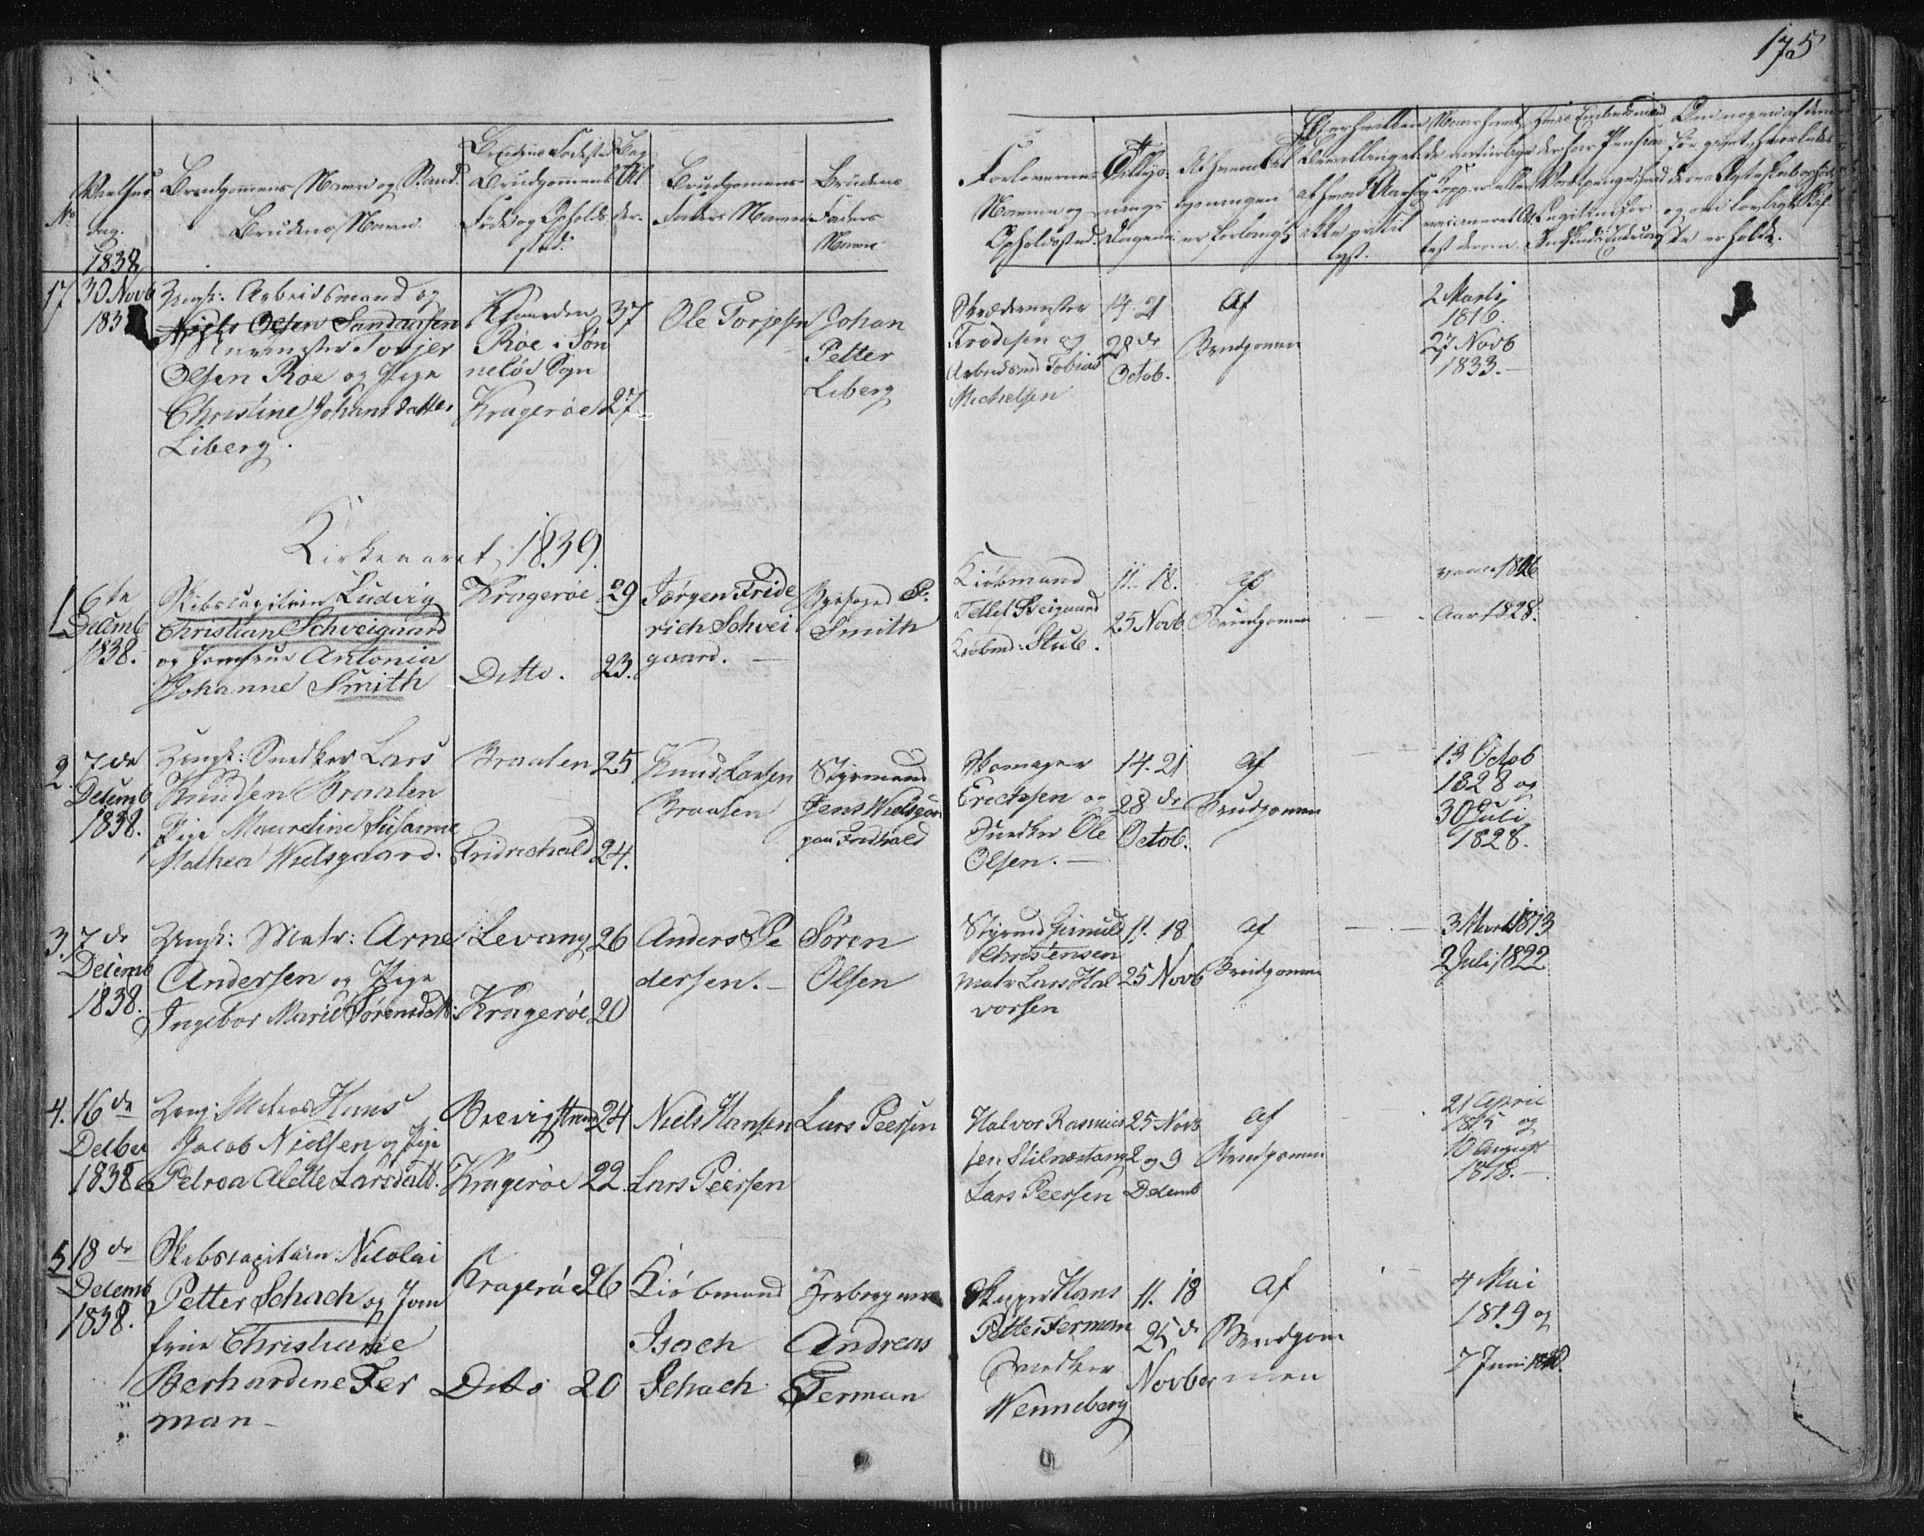 SAKO, Kragerø kirkebøker, F/Fa/L0005: Ministerialbok nr. 5, 1832-1847, s. 175